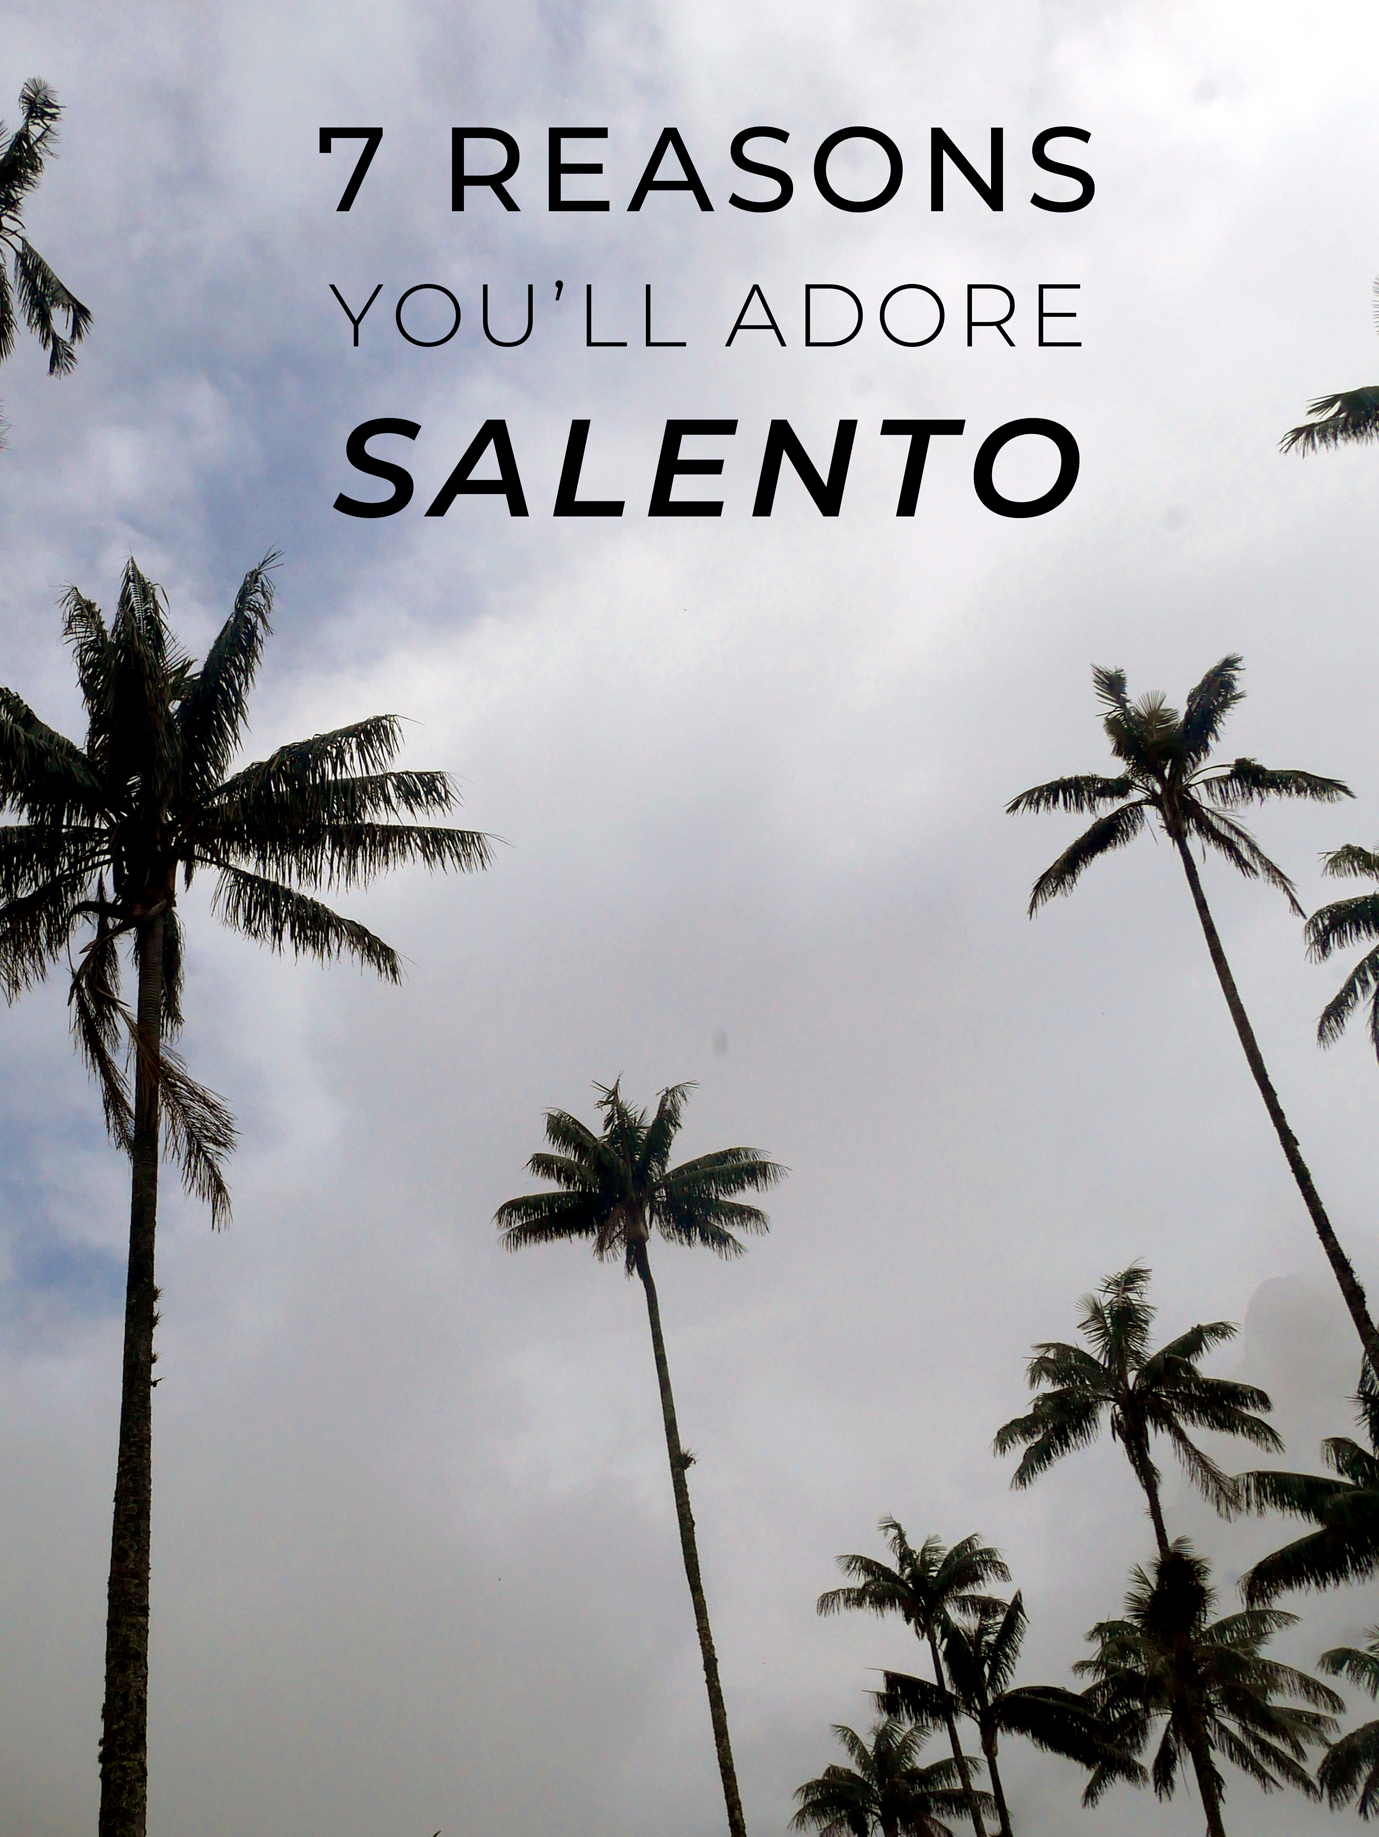 7 Reasons You'll Adore Salento, Colombia